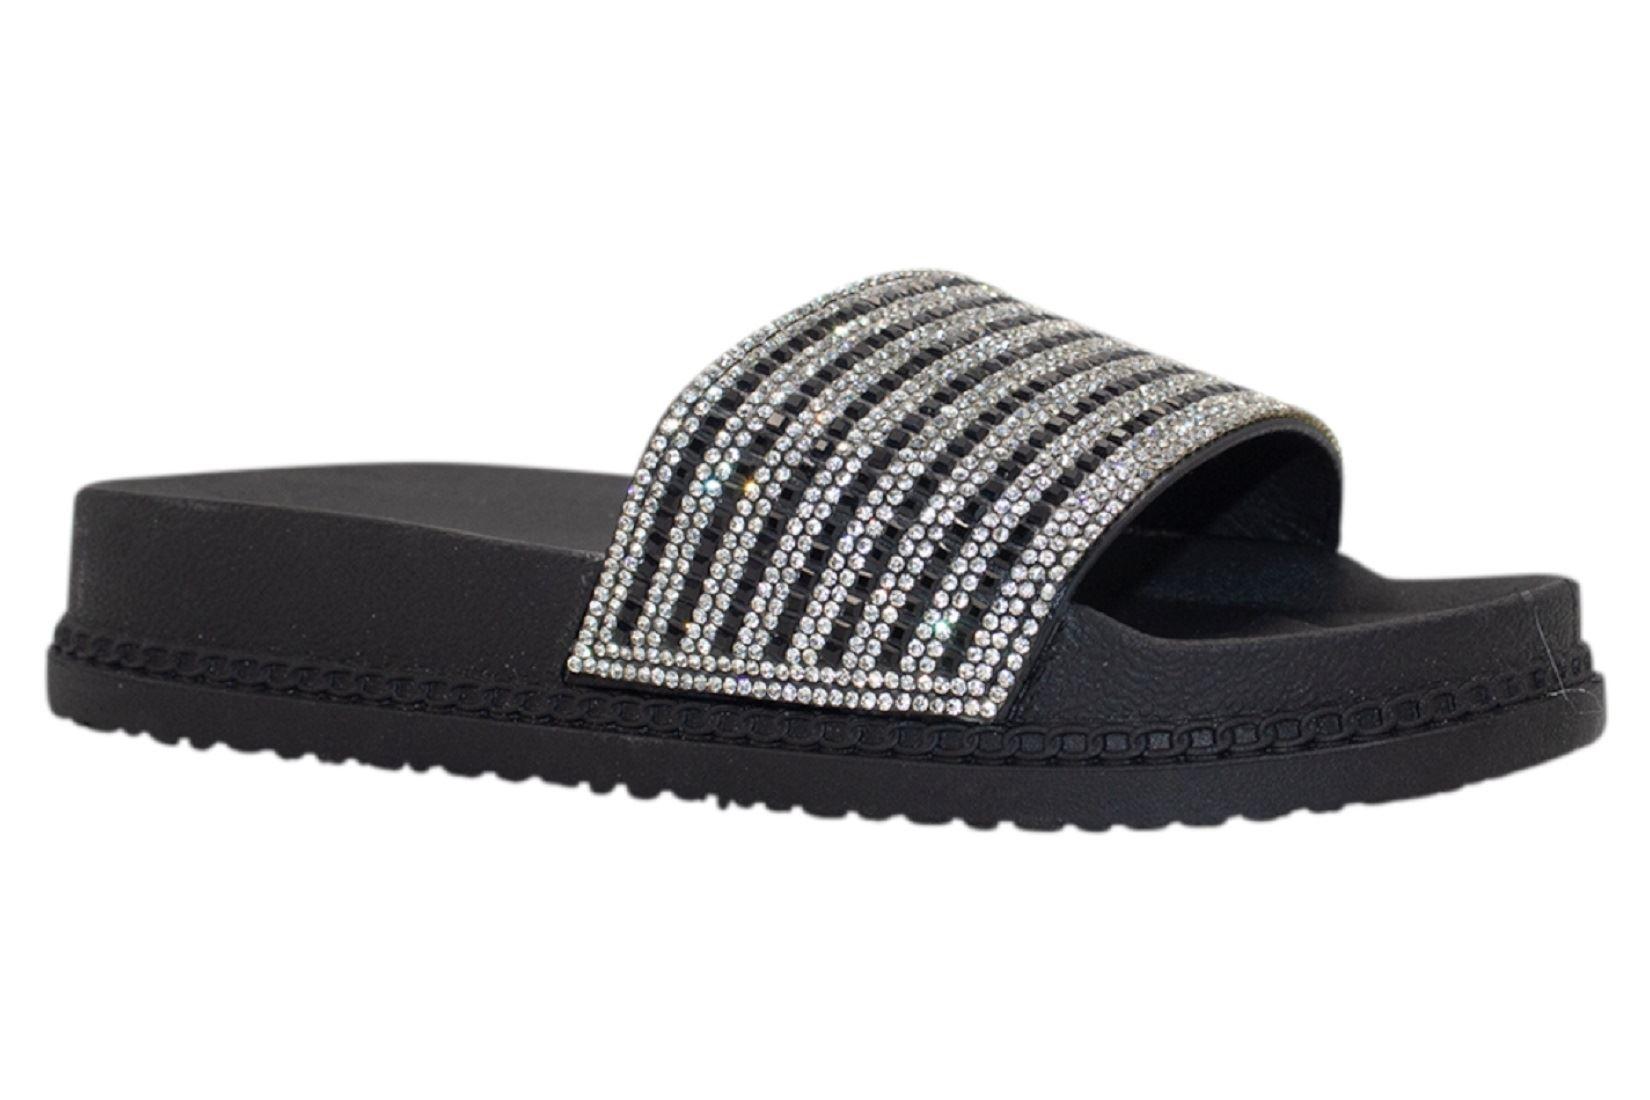 Womens-Sliders-Casual-Slippers-Mules-Ladies-Diamante-Flip-Flop-Sandals-Shoes thumbnail 33